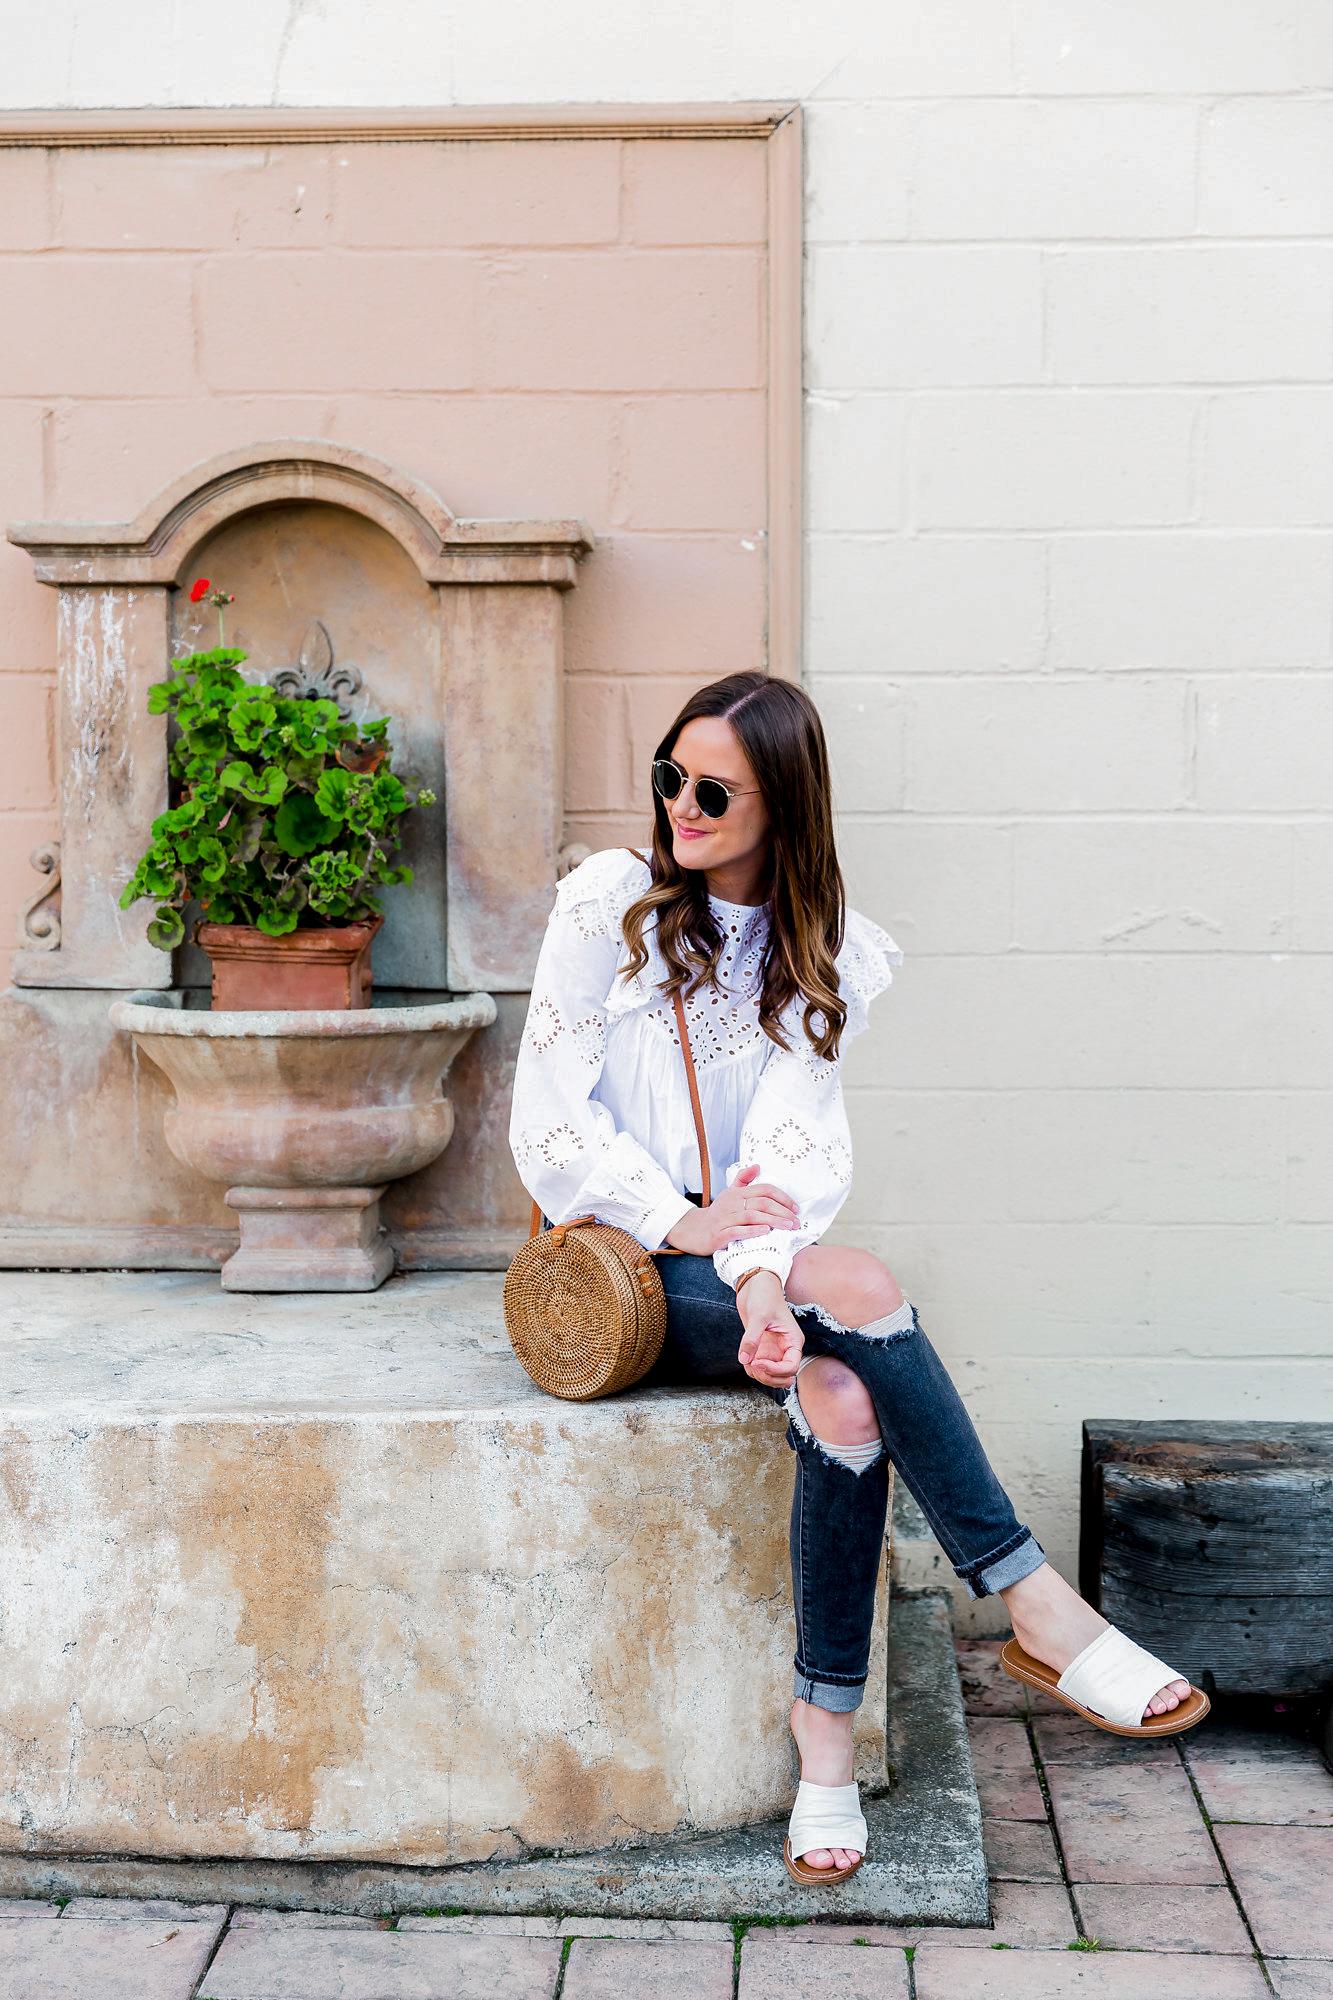 Shop the Look Below. HM Top - see similar styles below |  Levi's Jeans  |  Nordstrom Sandals  |  Kinilush Bag  |  Daniel Wellington Watch  c/o | Ray-Ban Sunglasses